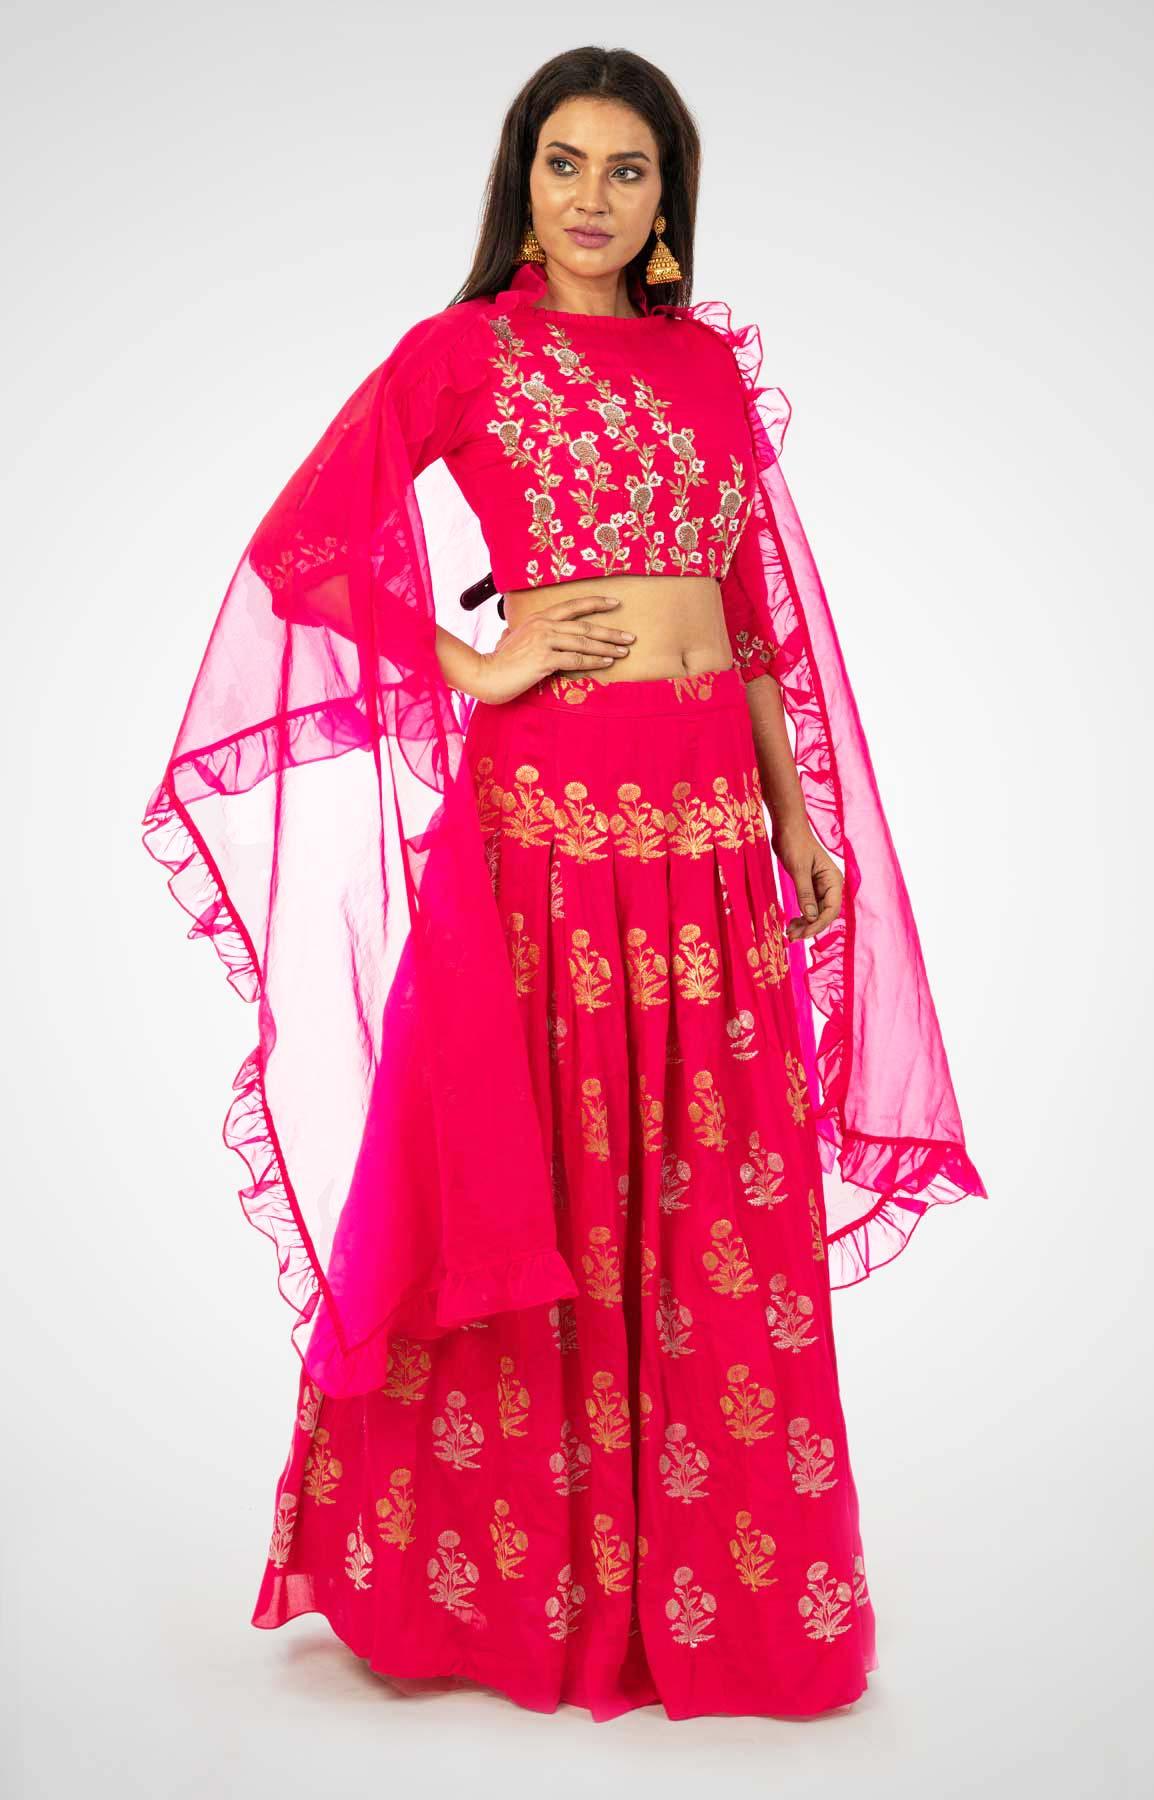 Rani Pink Dupion Silk Crop Top And Skirt With Zardozi Work – Viraaya By Ushnakmals